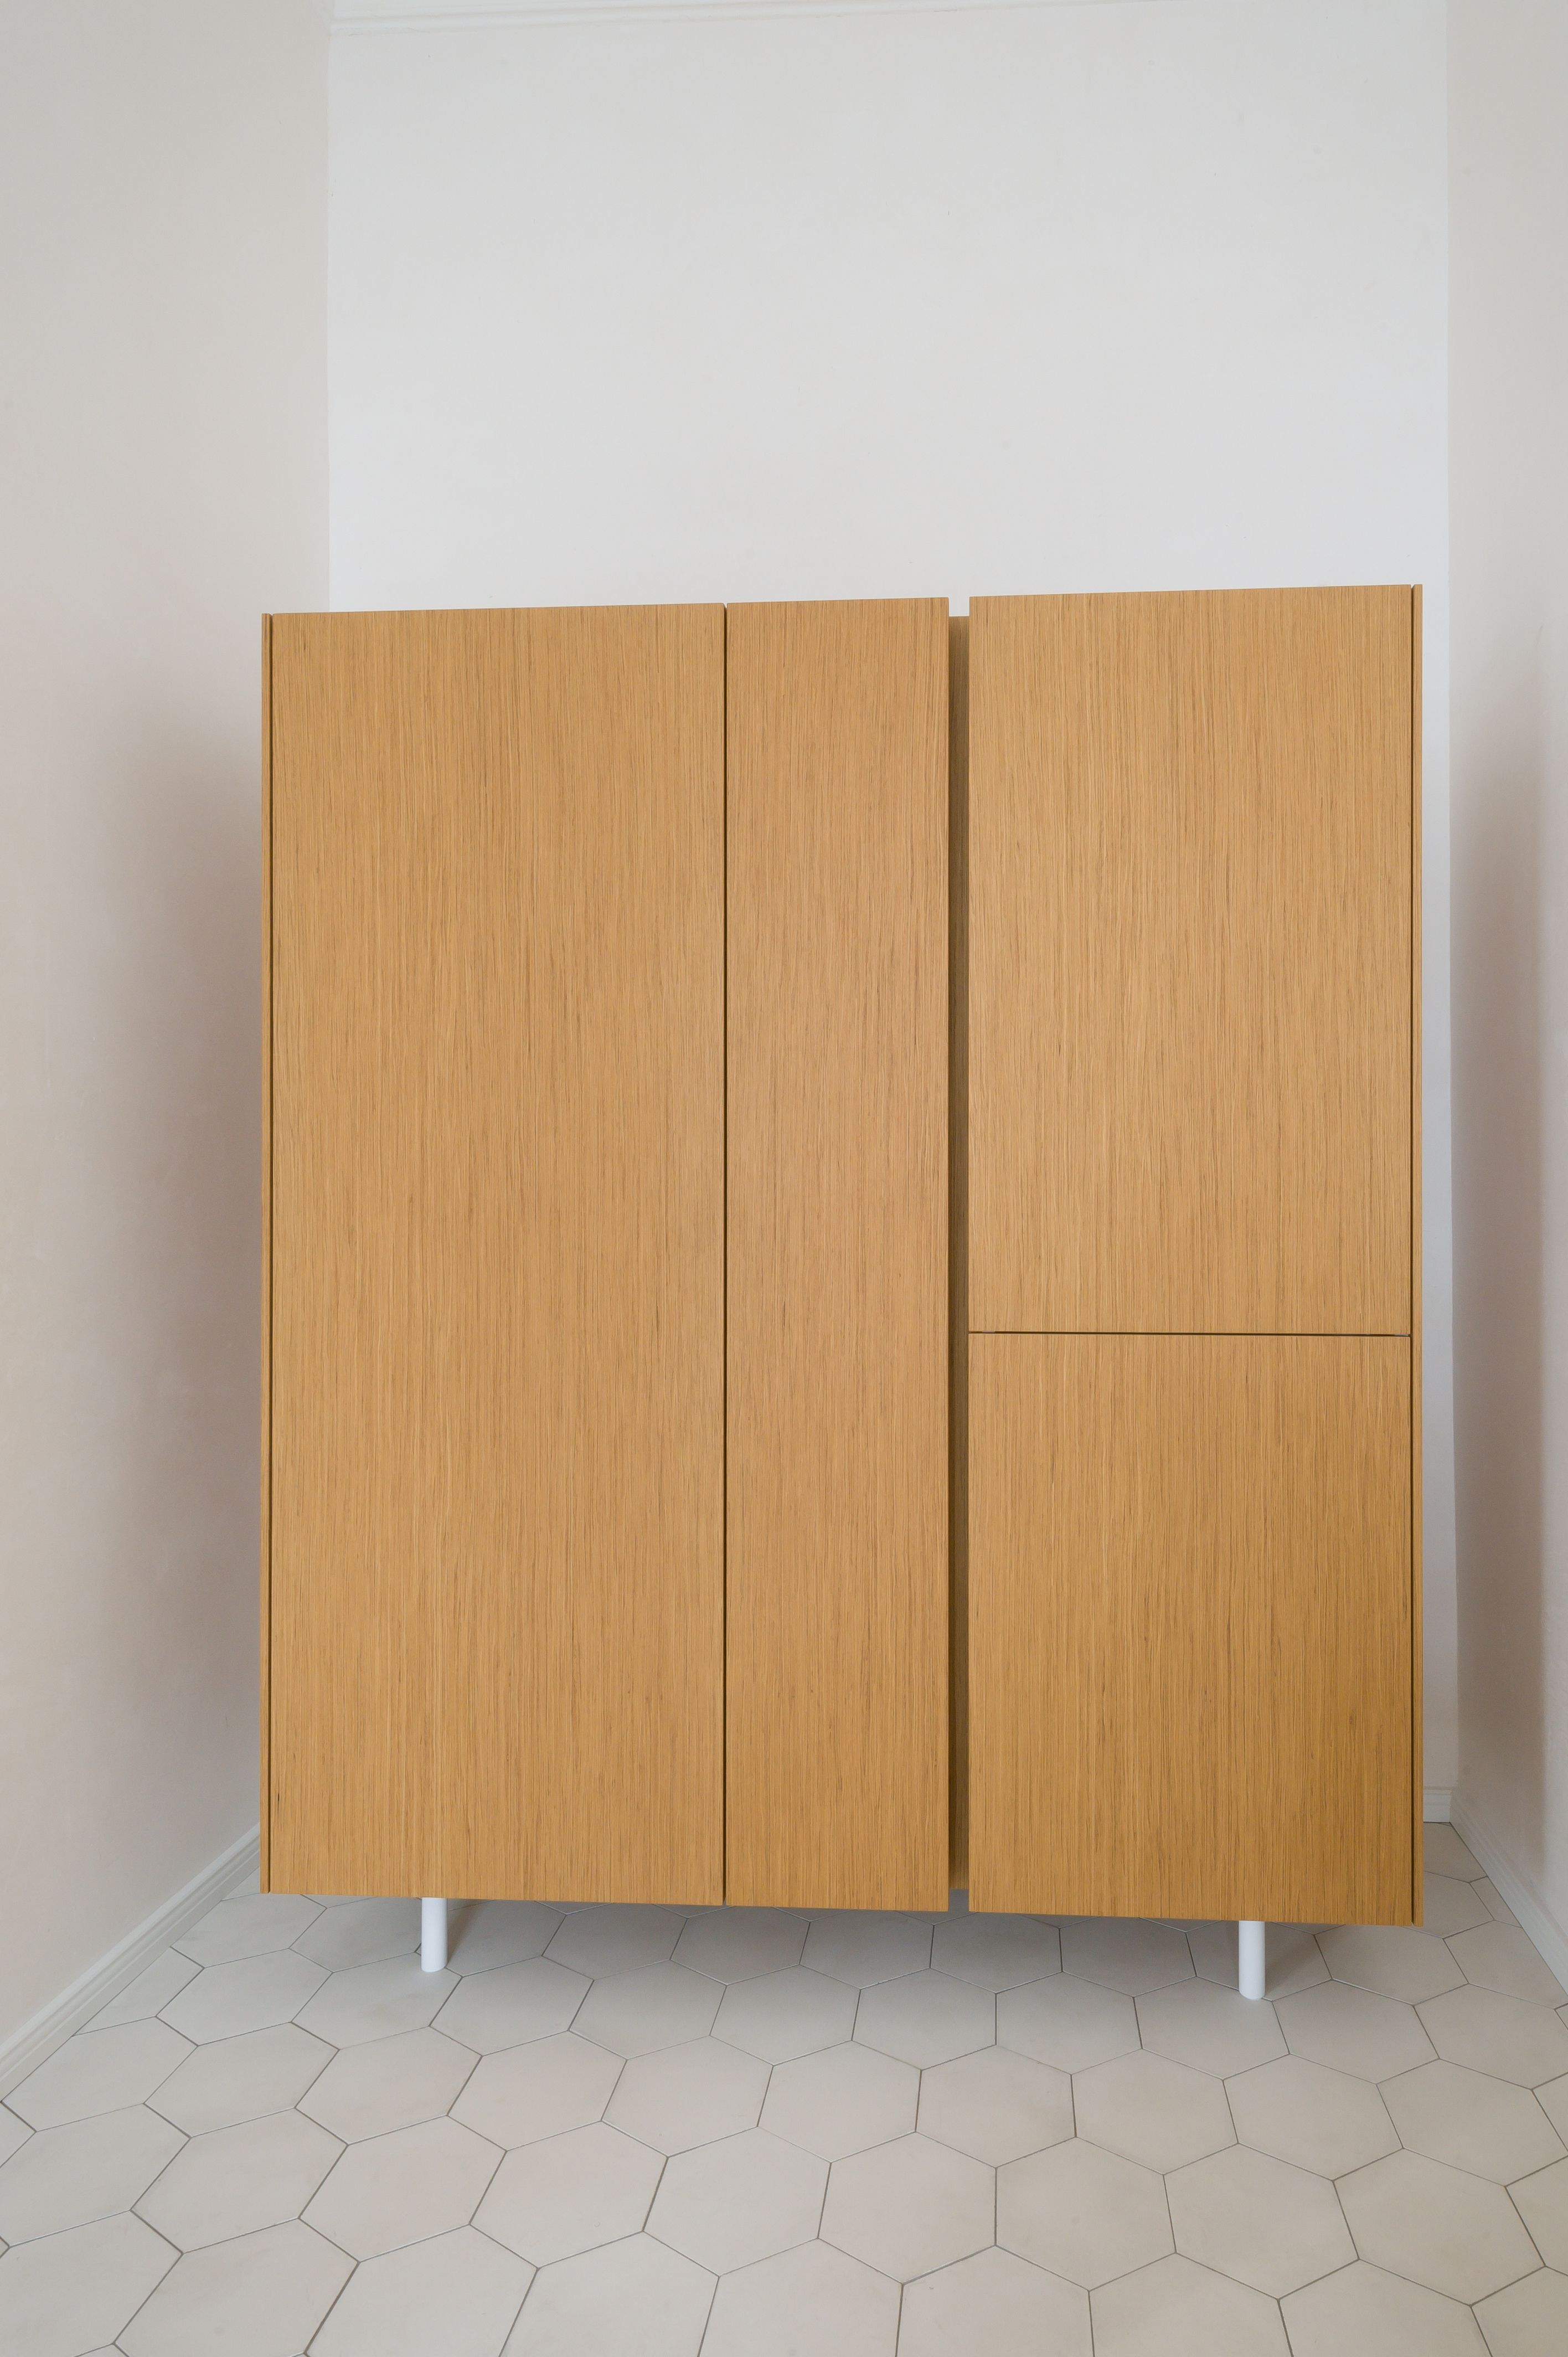 Küche aus Eichenholz | Kühlschrank, Mikrowelle, Ofen